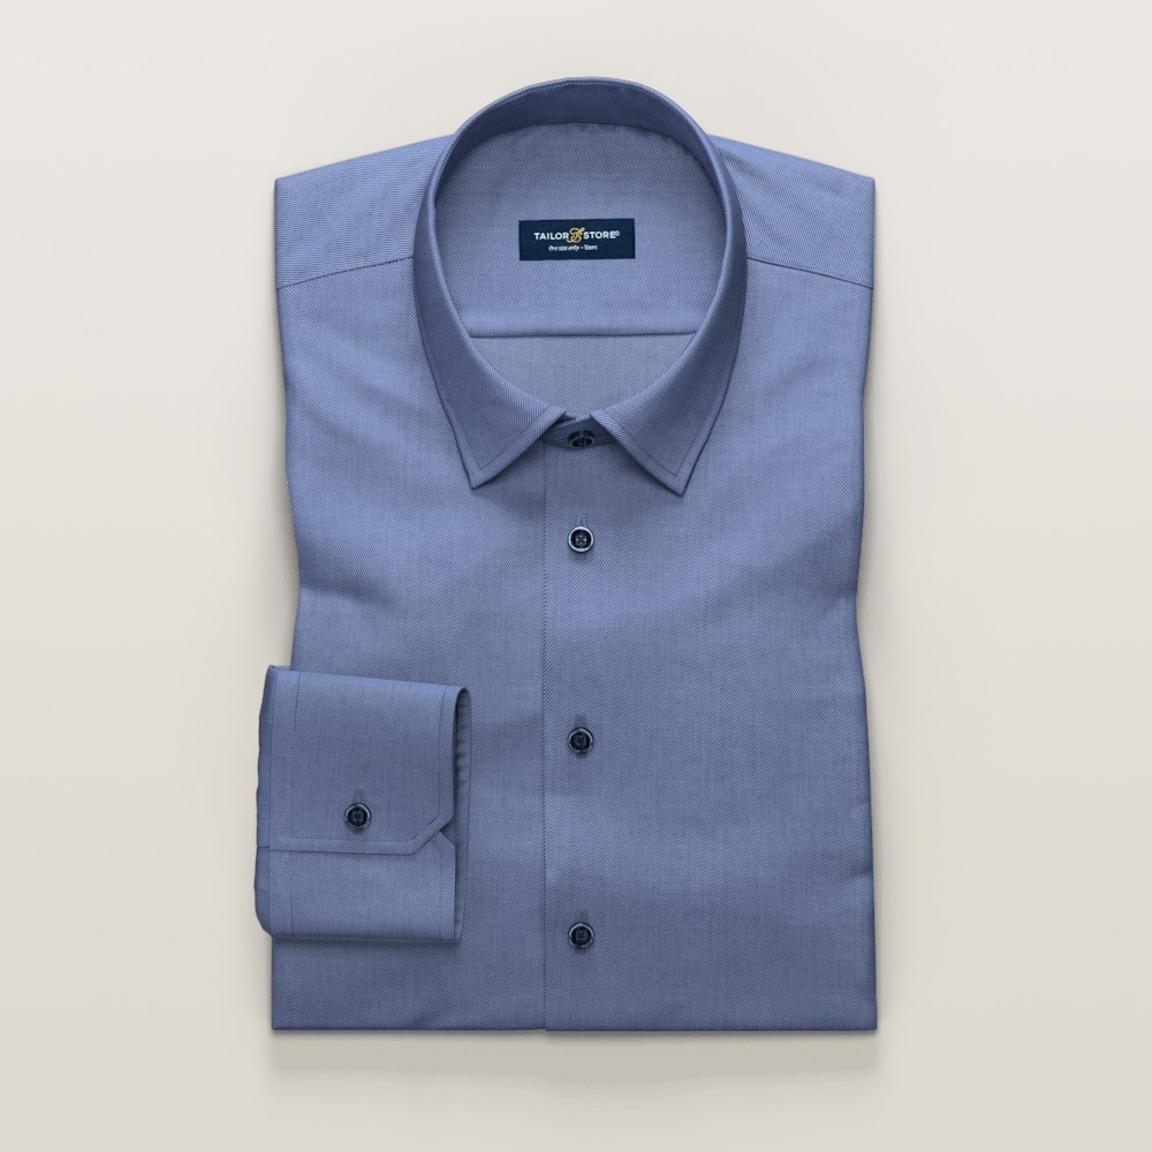 Business-skjorte i mørkeblå twill til dame